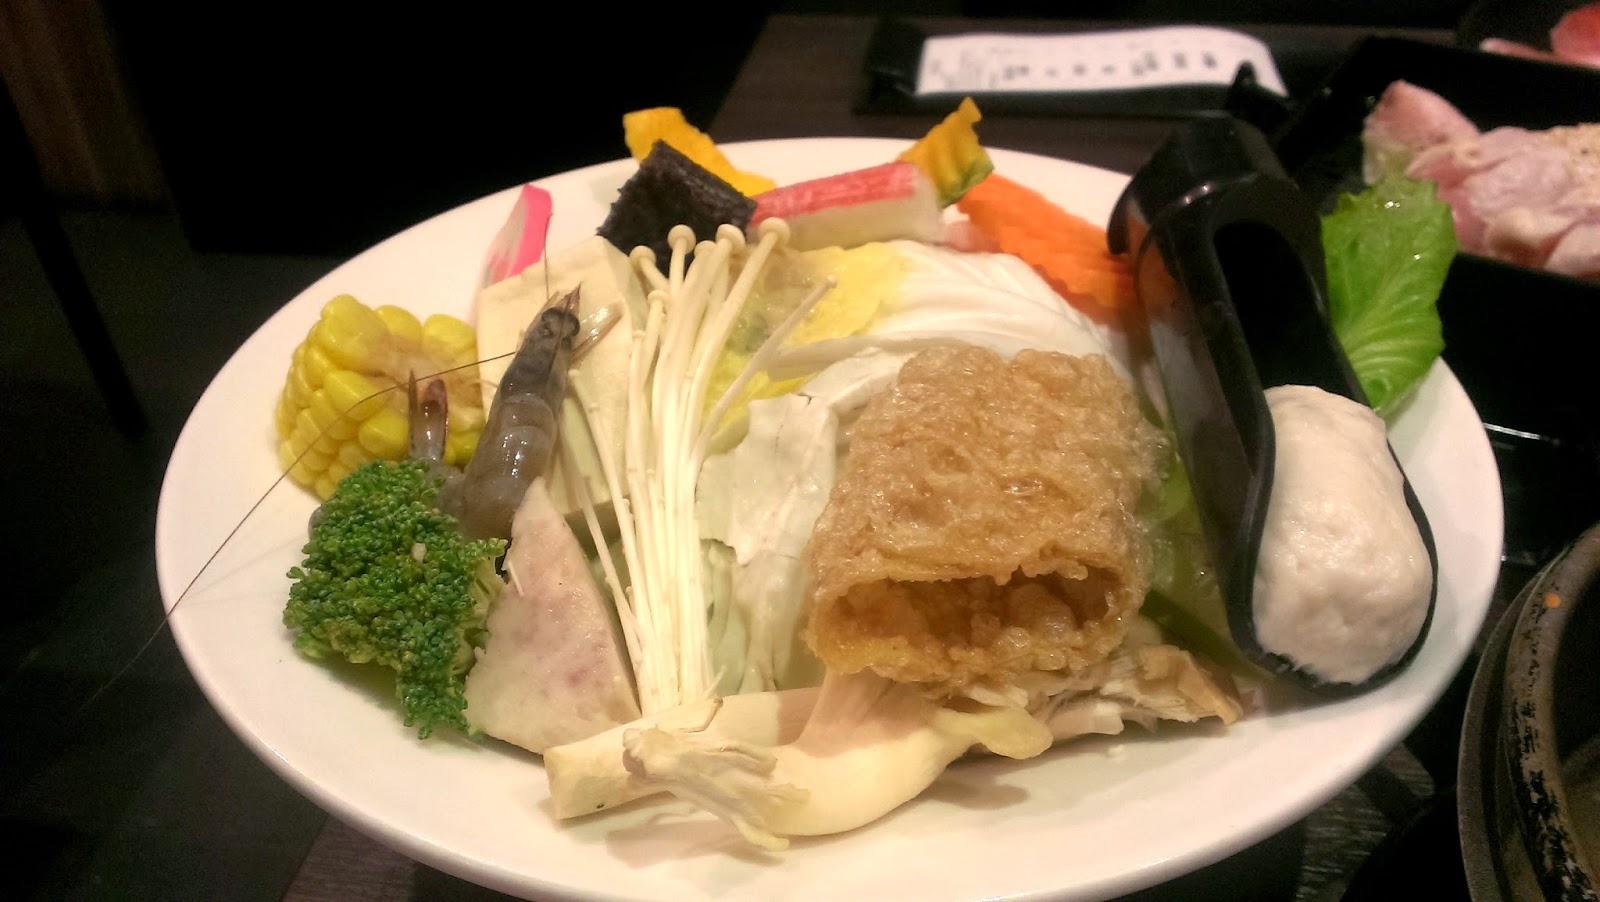 2014 08 18%2B19.18.11 - [食記] 老樣子 - 嘉義民雄火鍋店